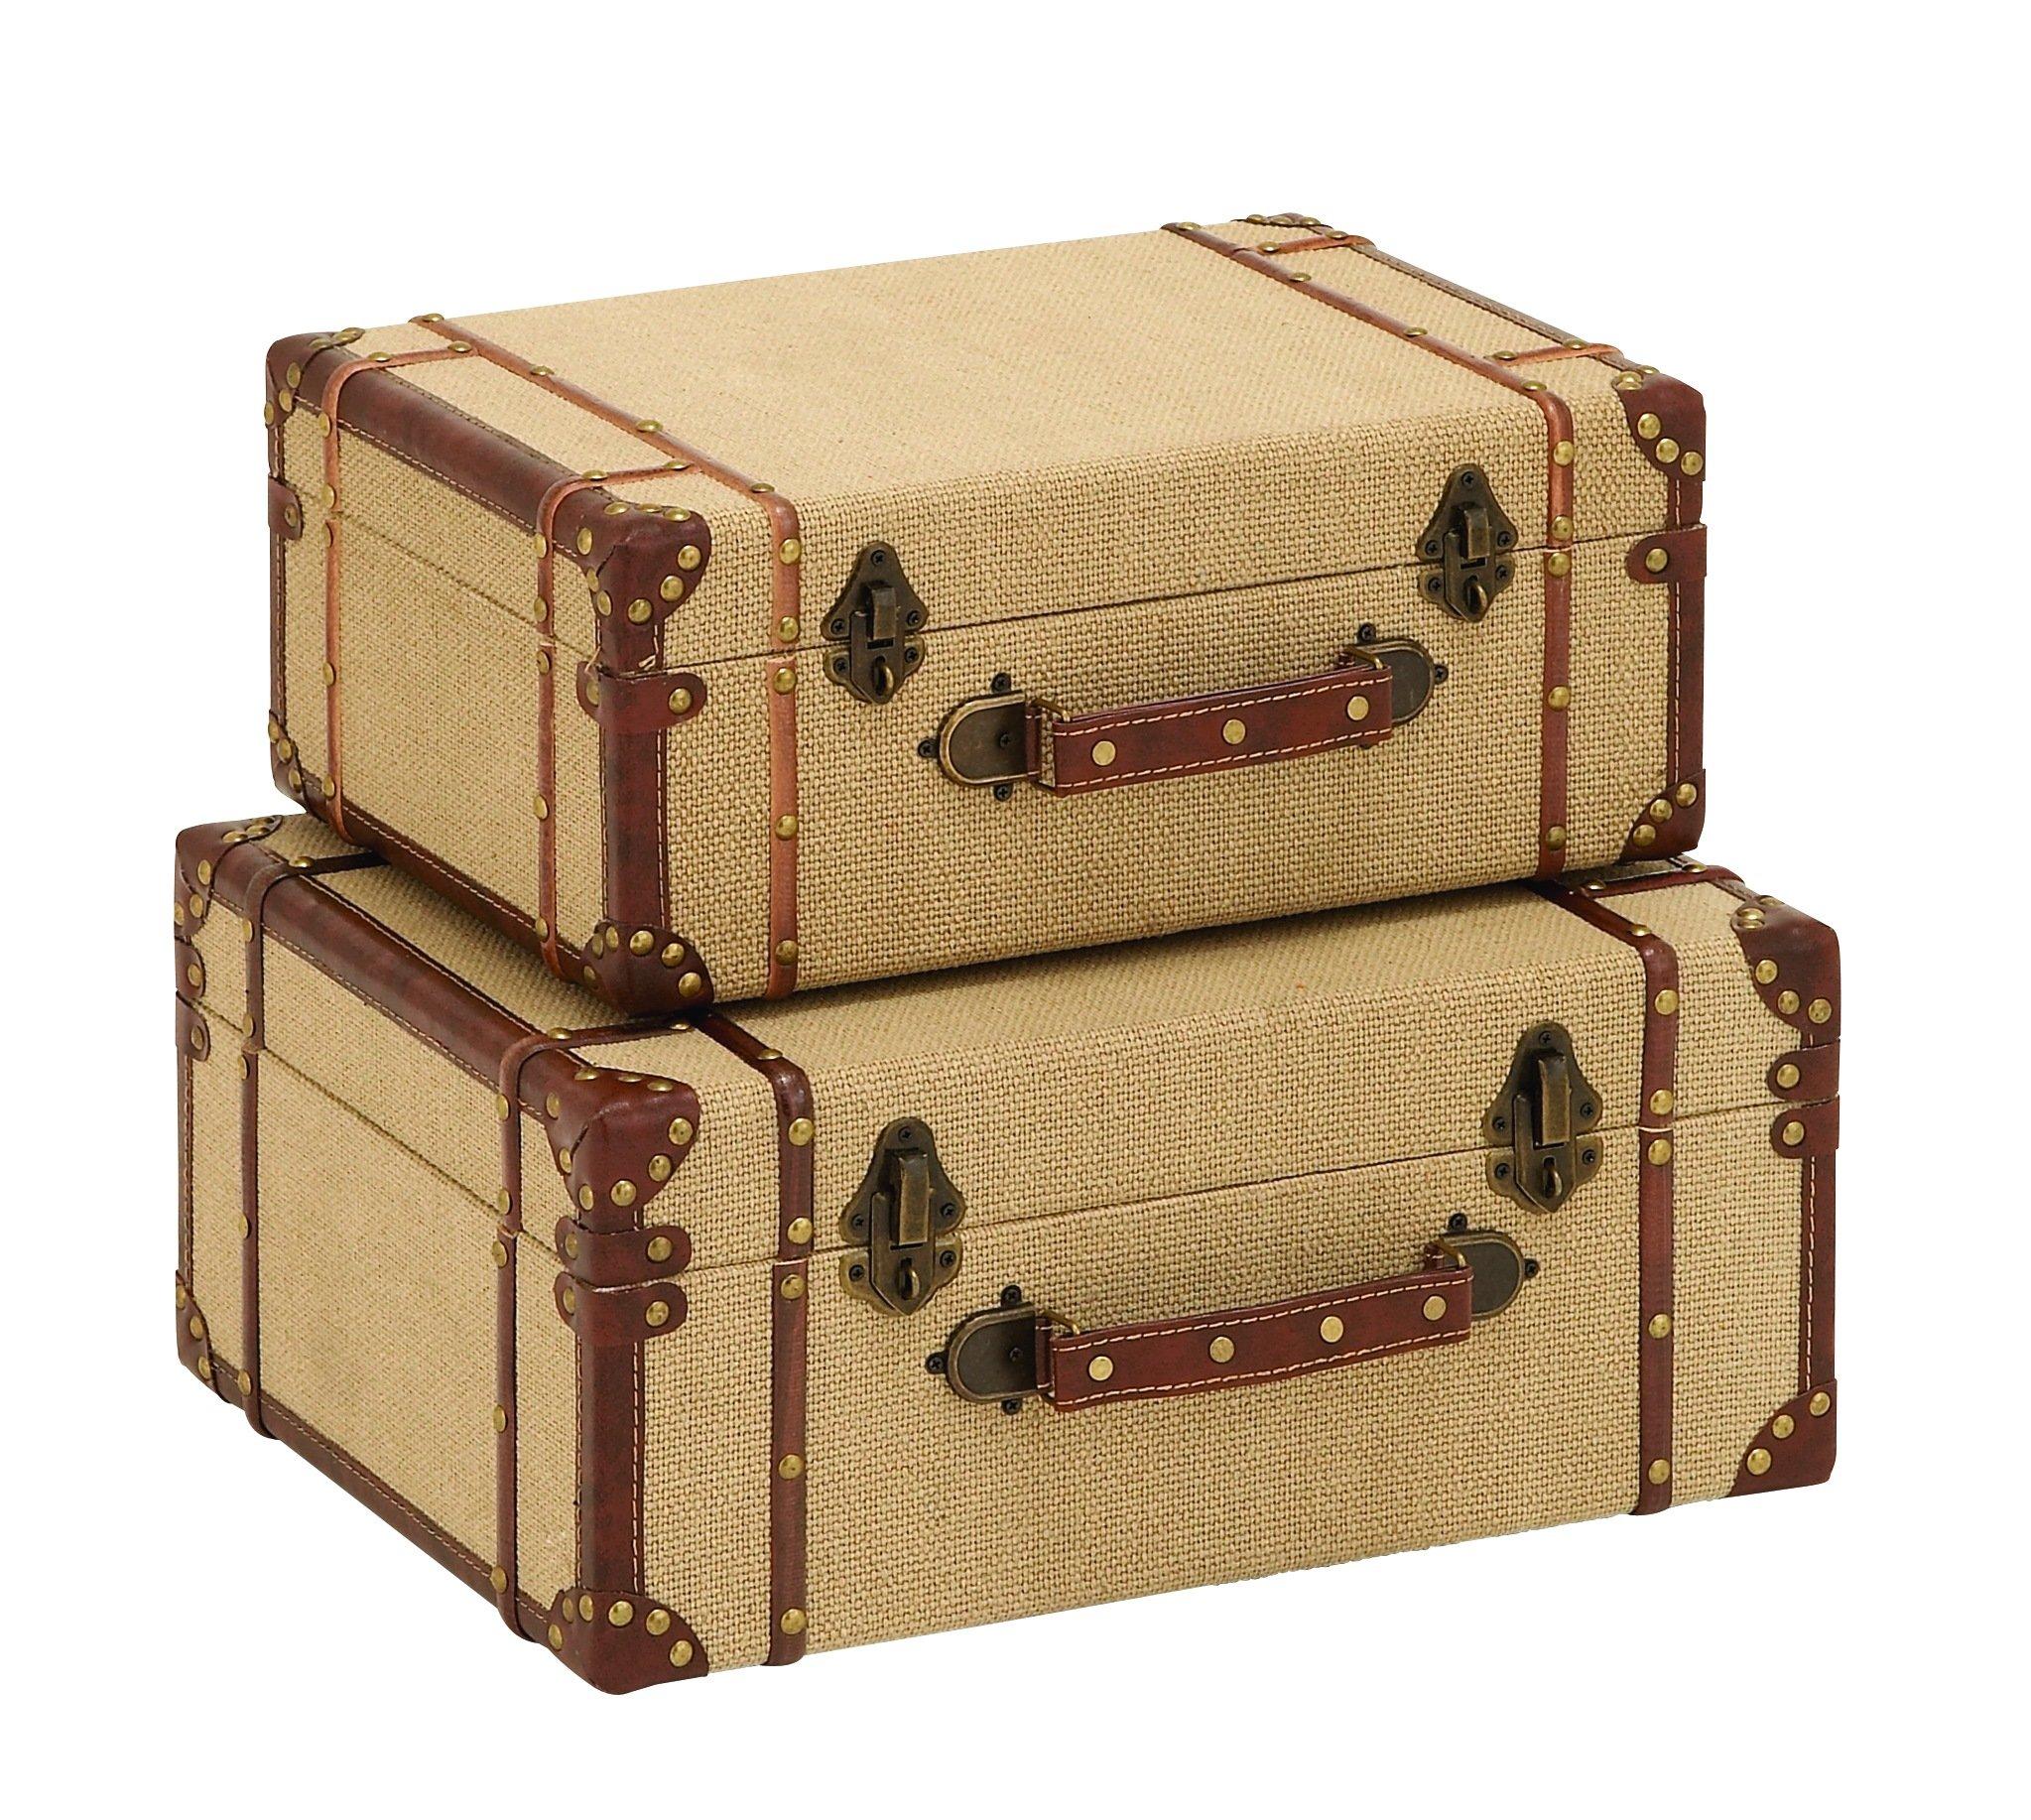 Benzara Old Look Burlap Travel Suitcase Set Accents